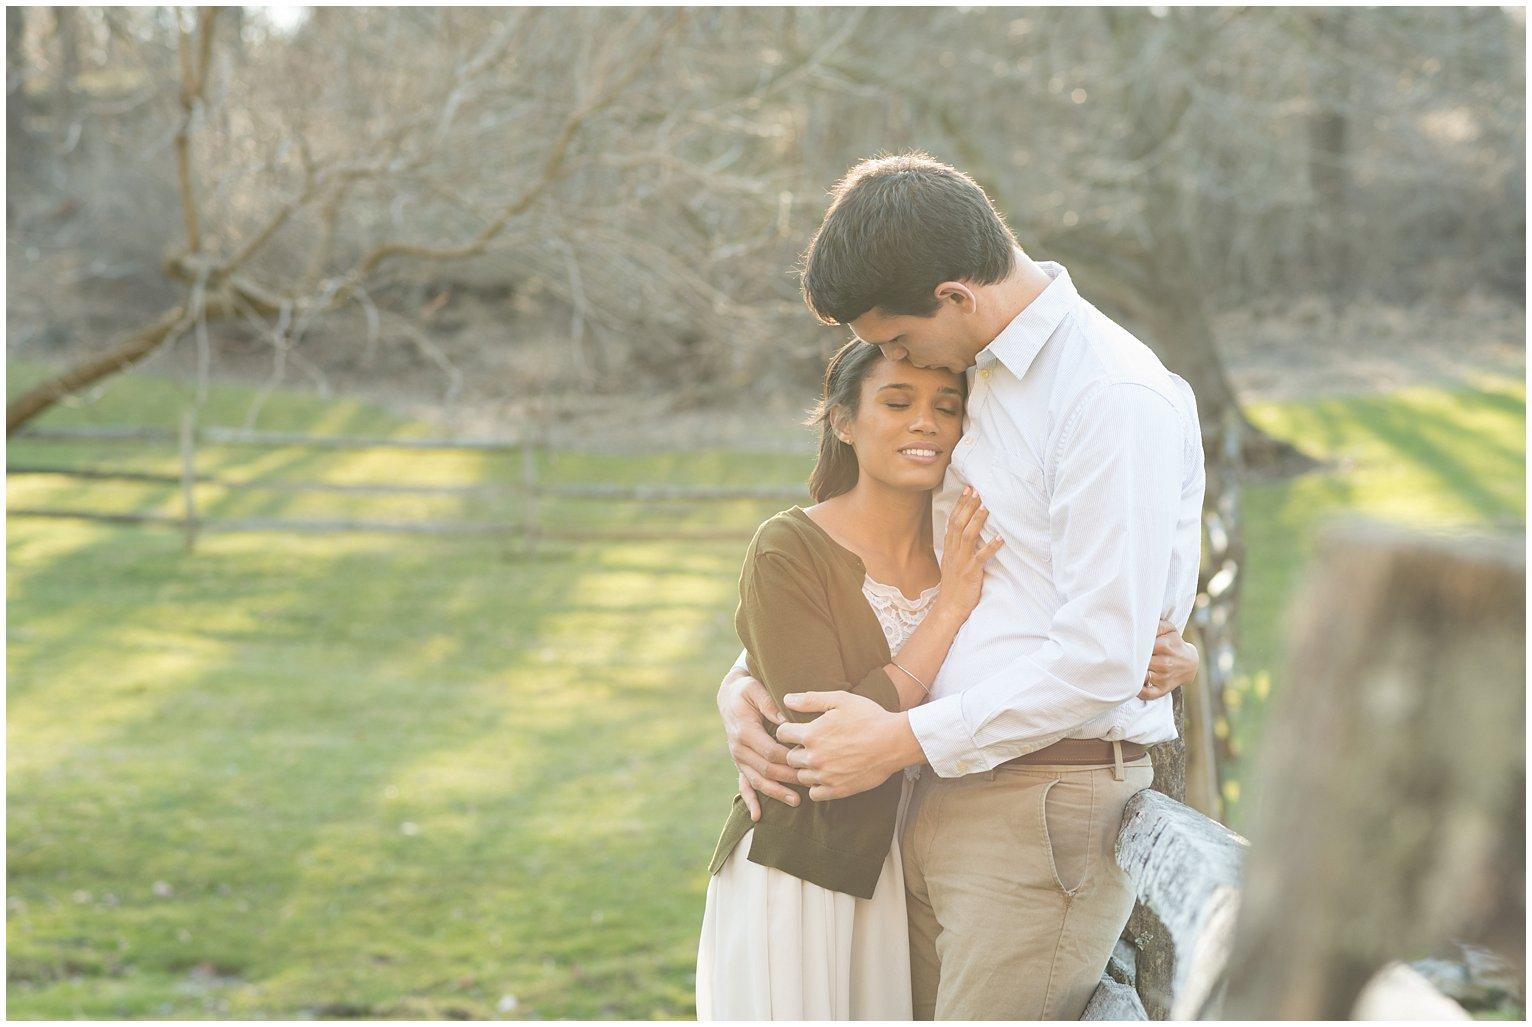 rockford-plantation-engagement-session-goldensun-love-photo